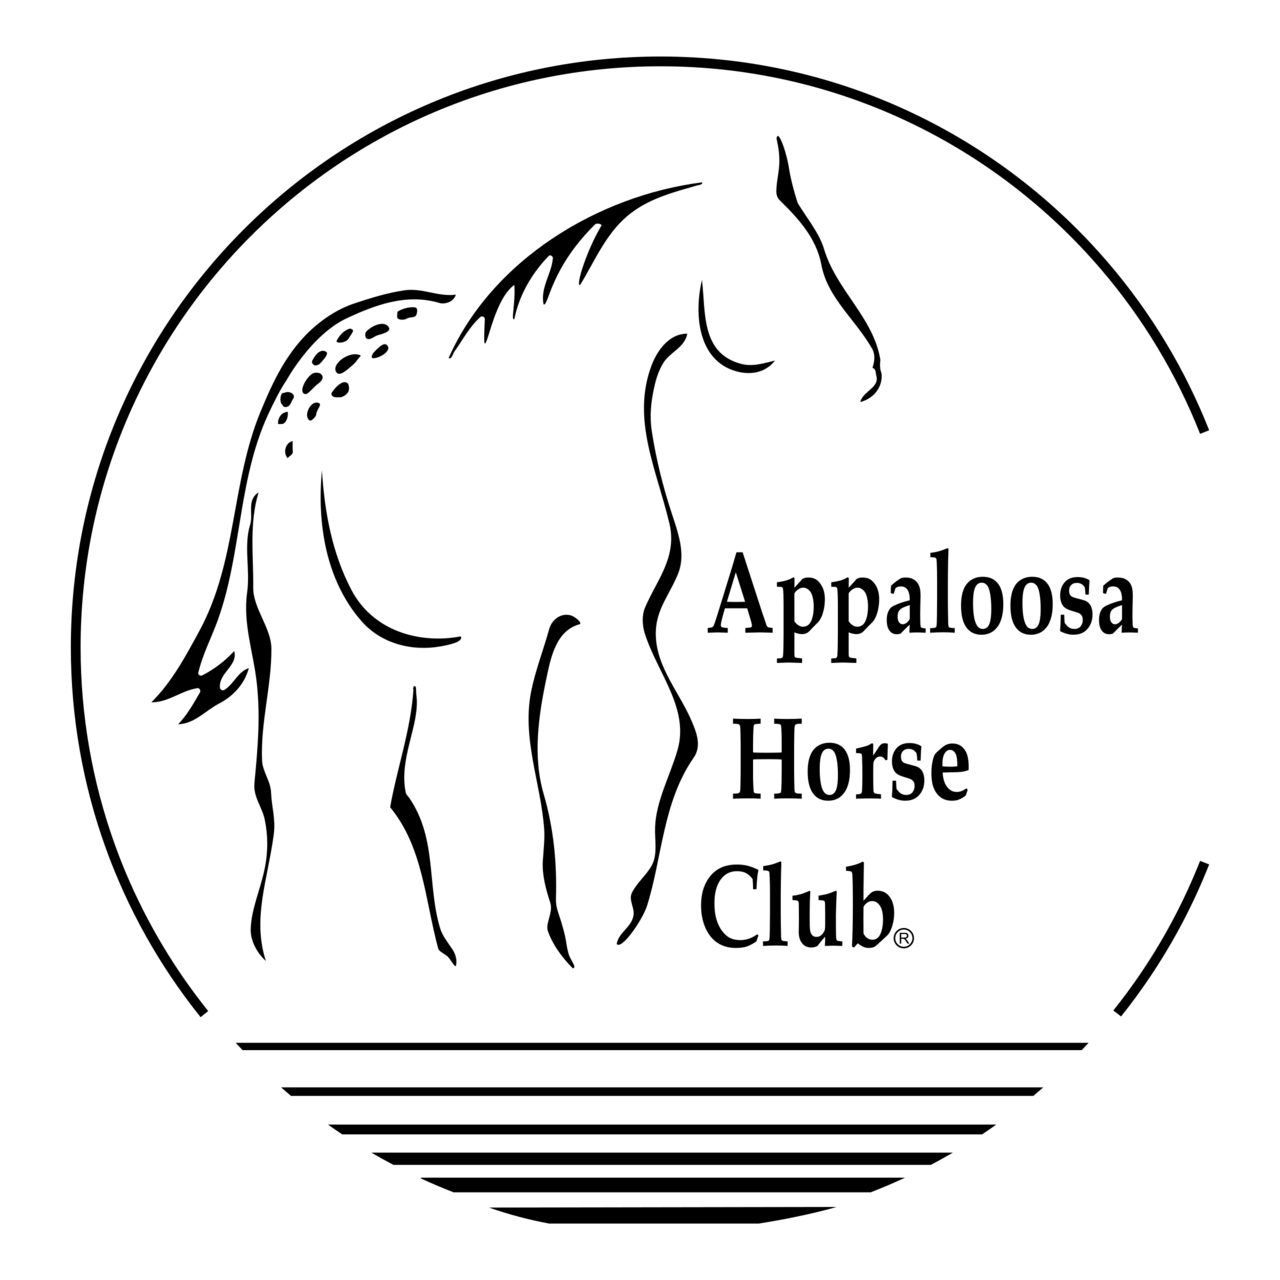 Appaloosa Horse Club Logo Png Transparent Brands Logos